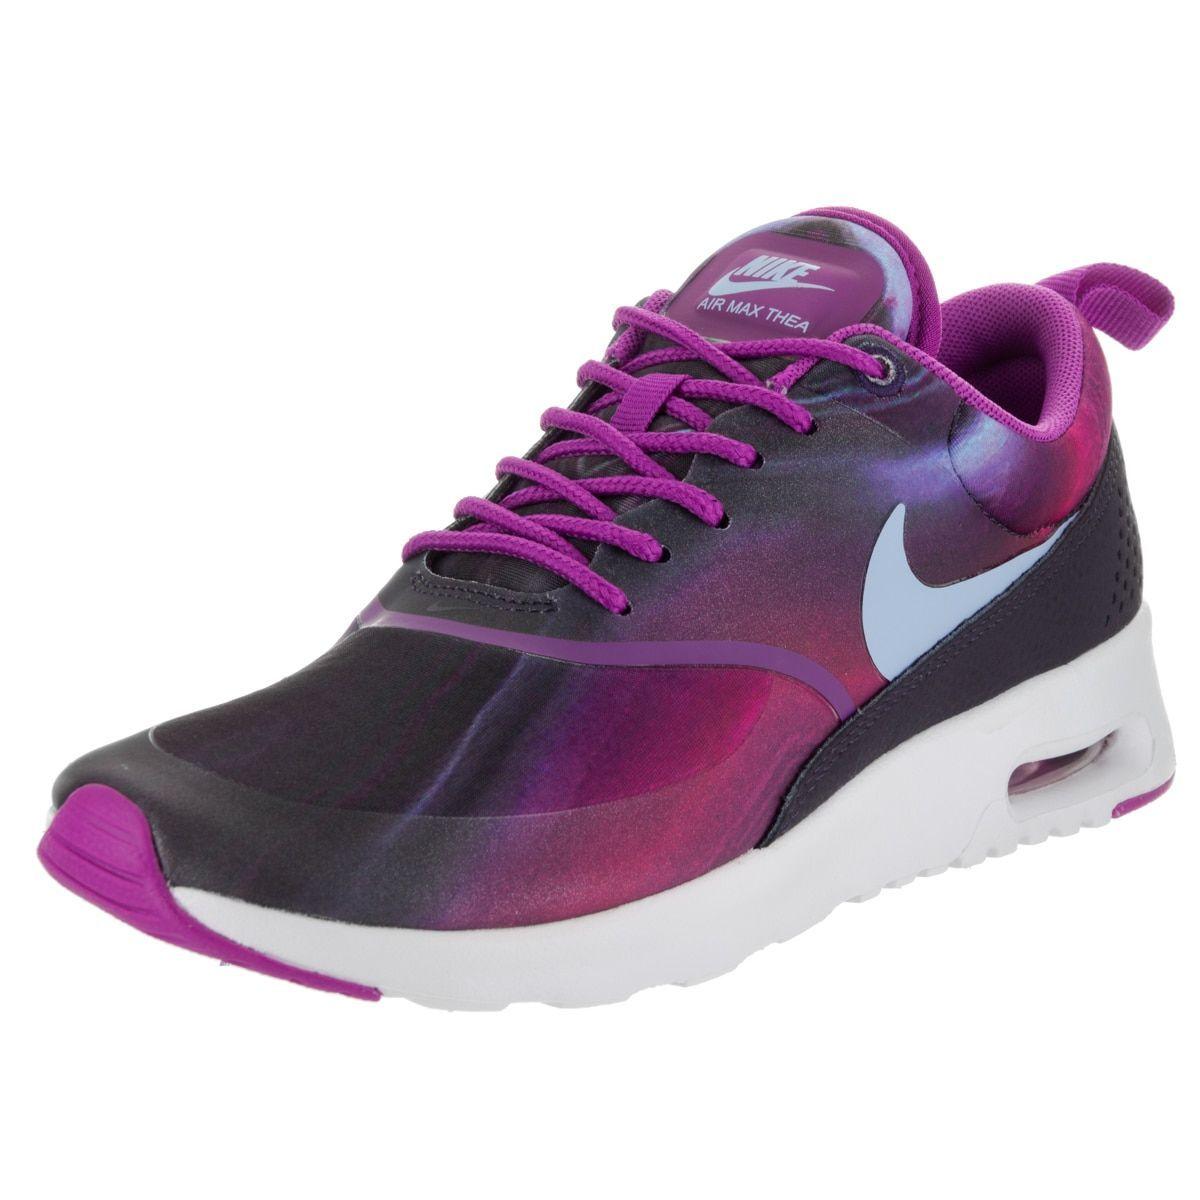 best website 3c179 741bd australia nike womens air max thea print running shoe 7b2db d5f1b